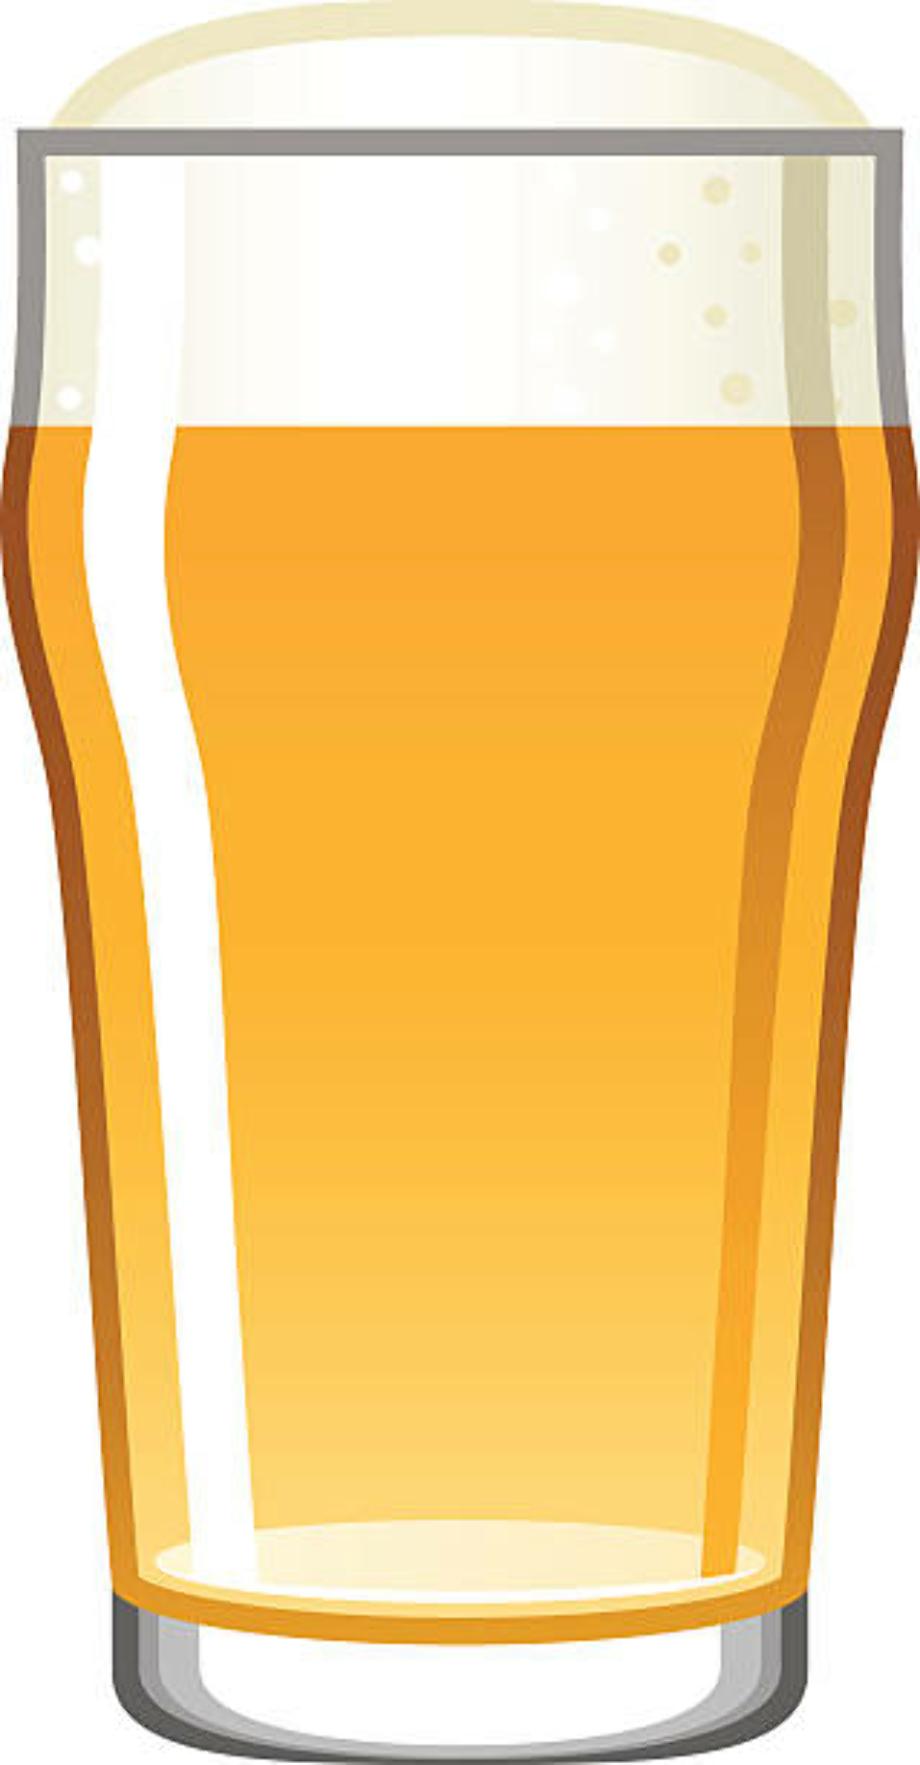 beer clipart pint